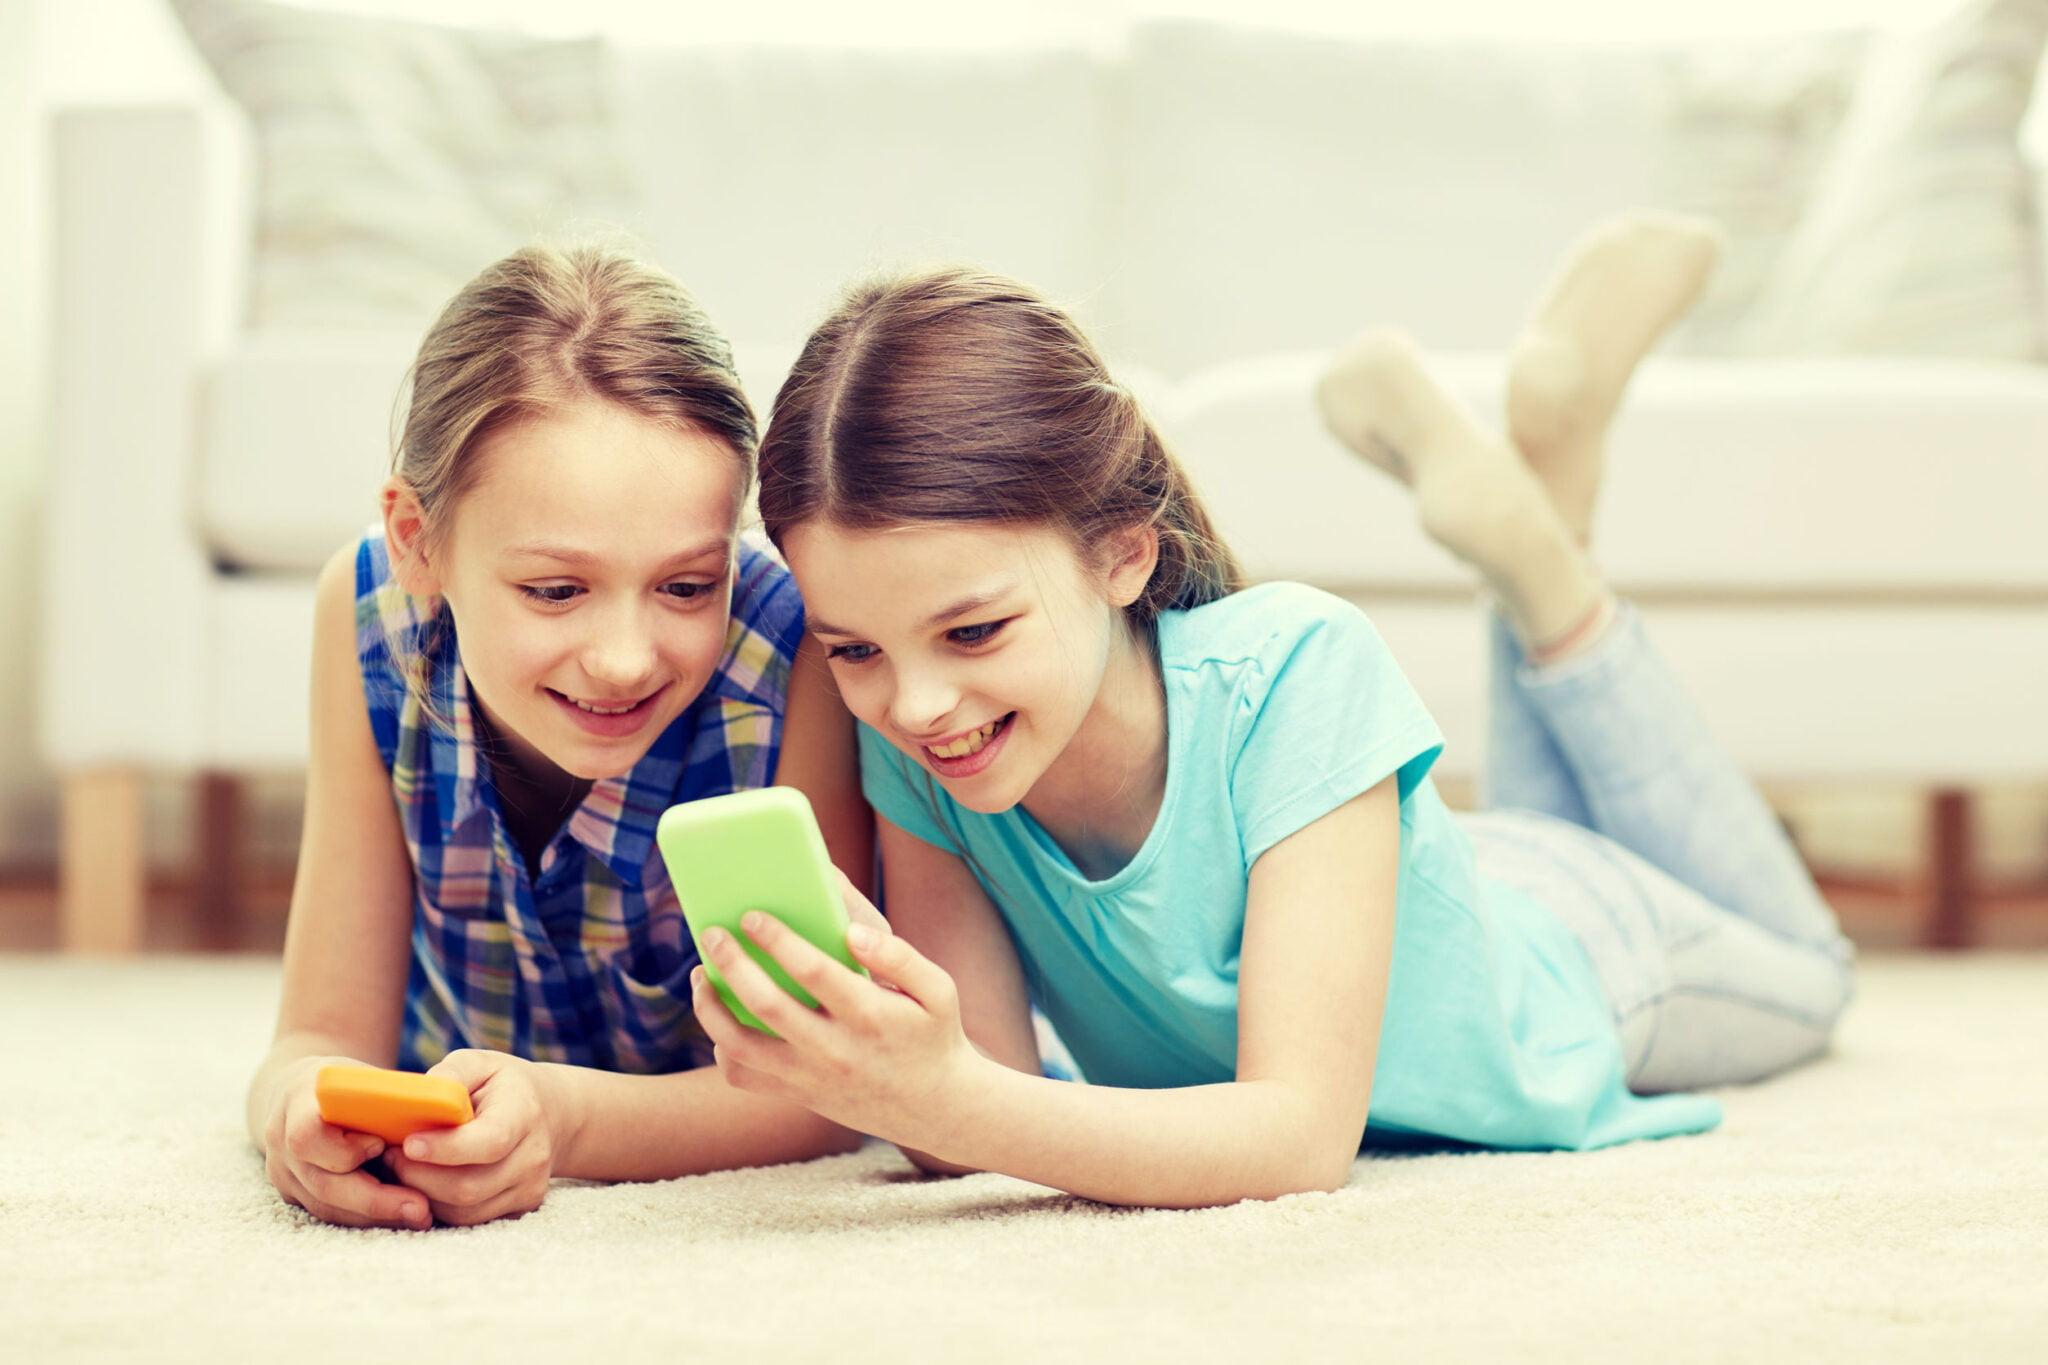 Afspraken mobiele telefoon kinderen - Mamaliefde.nl